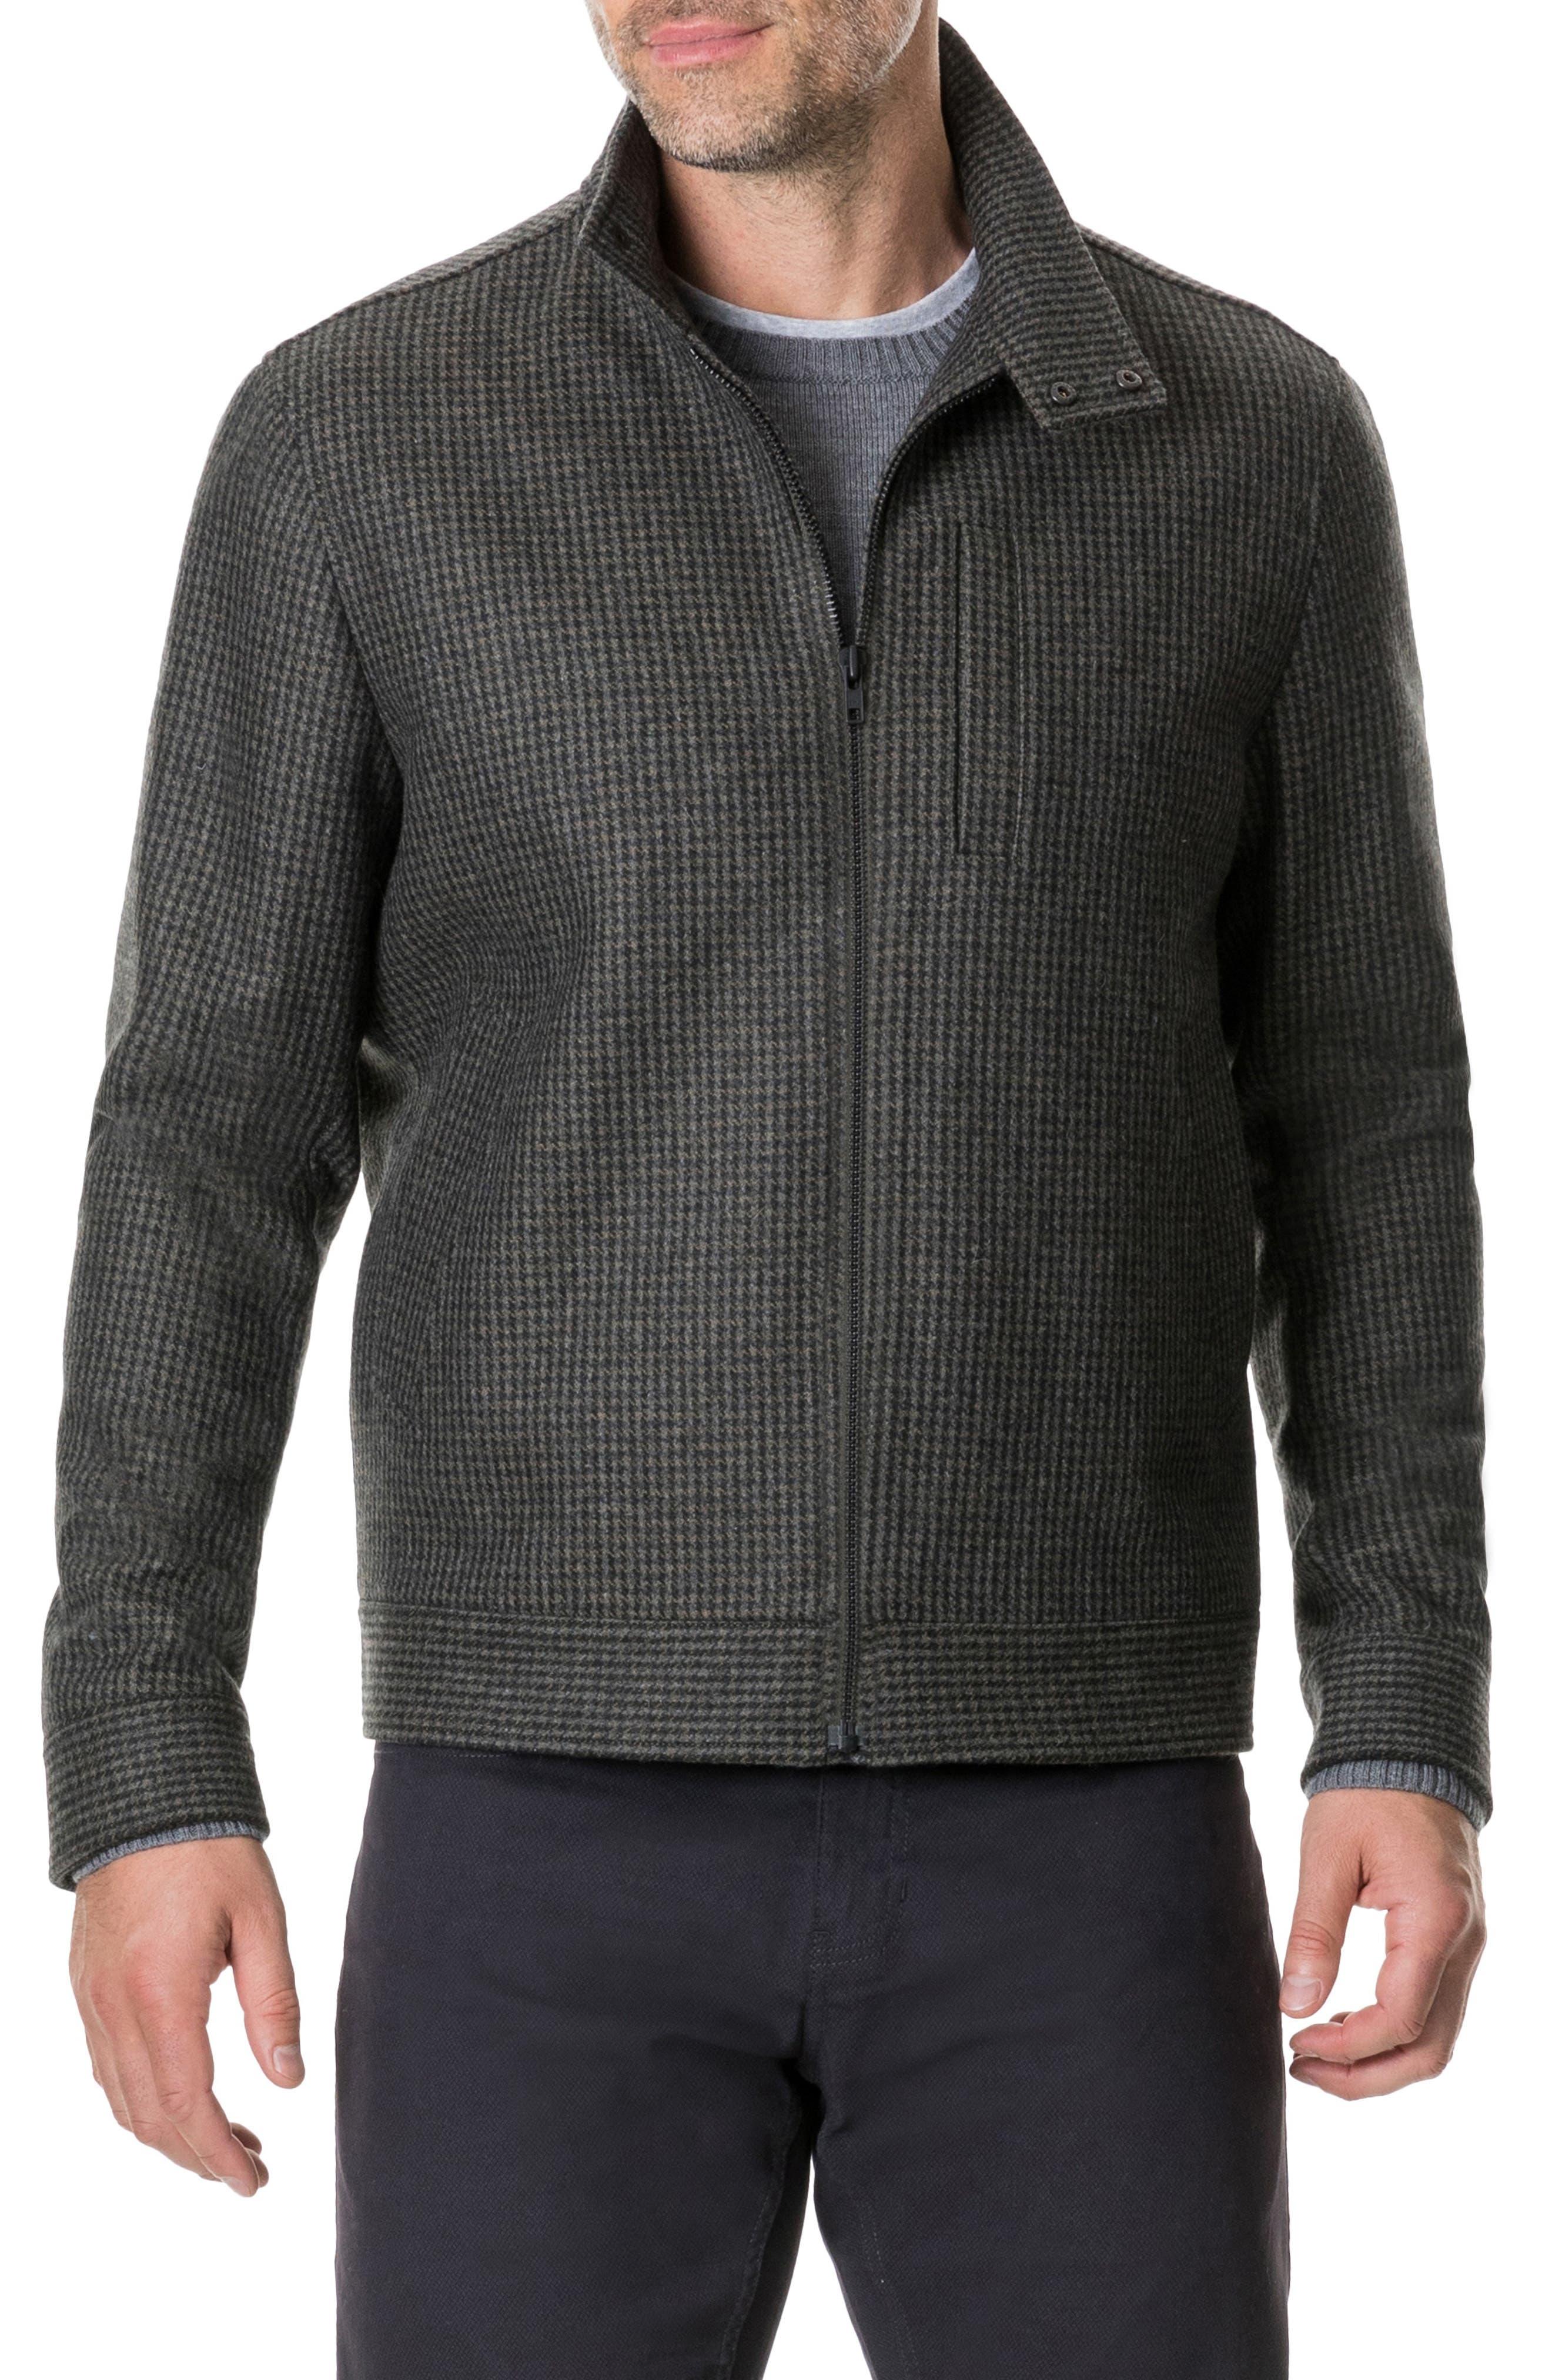 Oyster Cove Regular Fit Wool Blend Jacket,                         Main,                         color, OLIVE